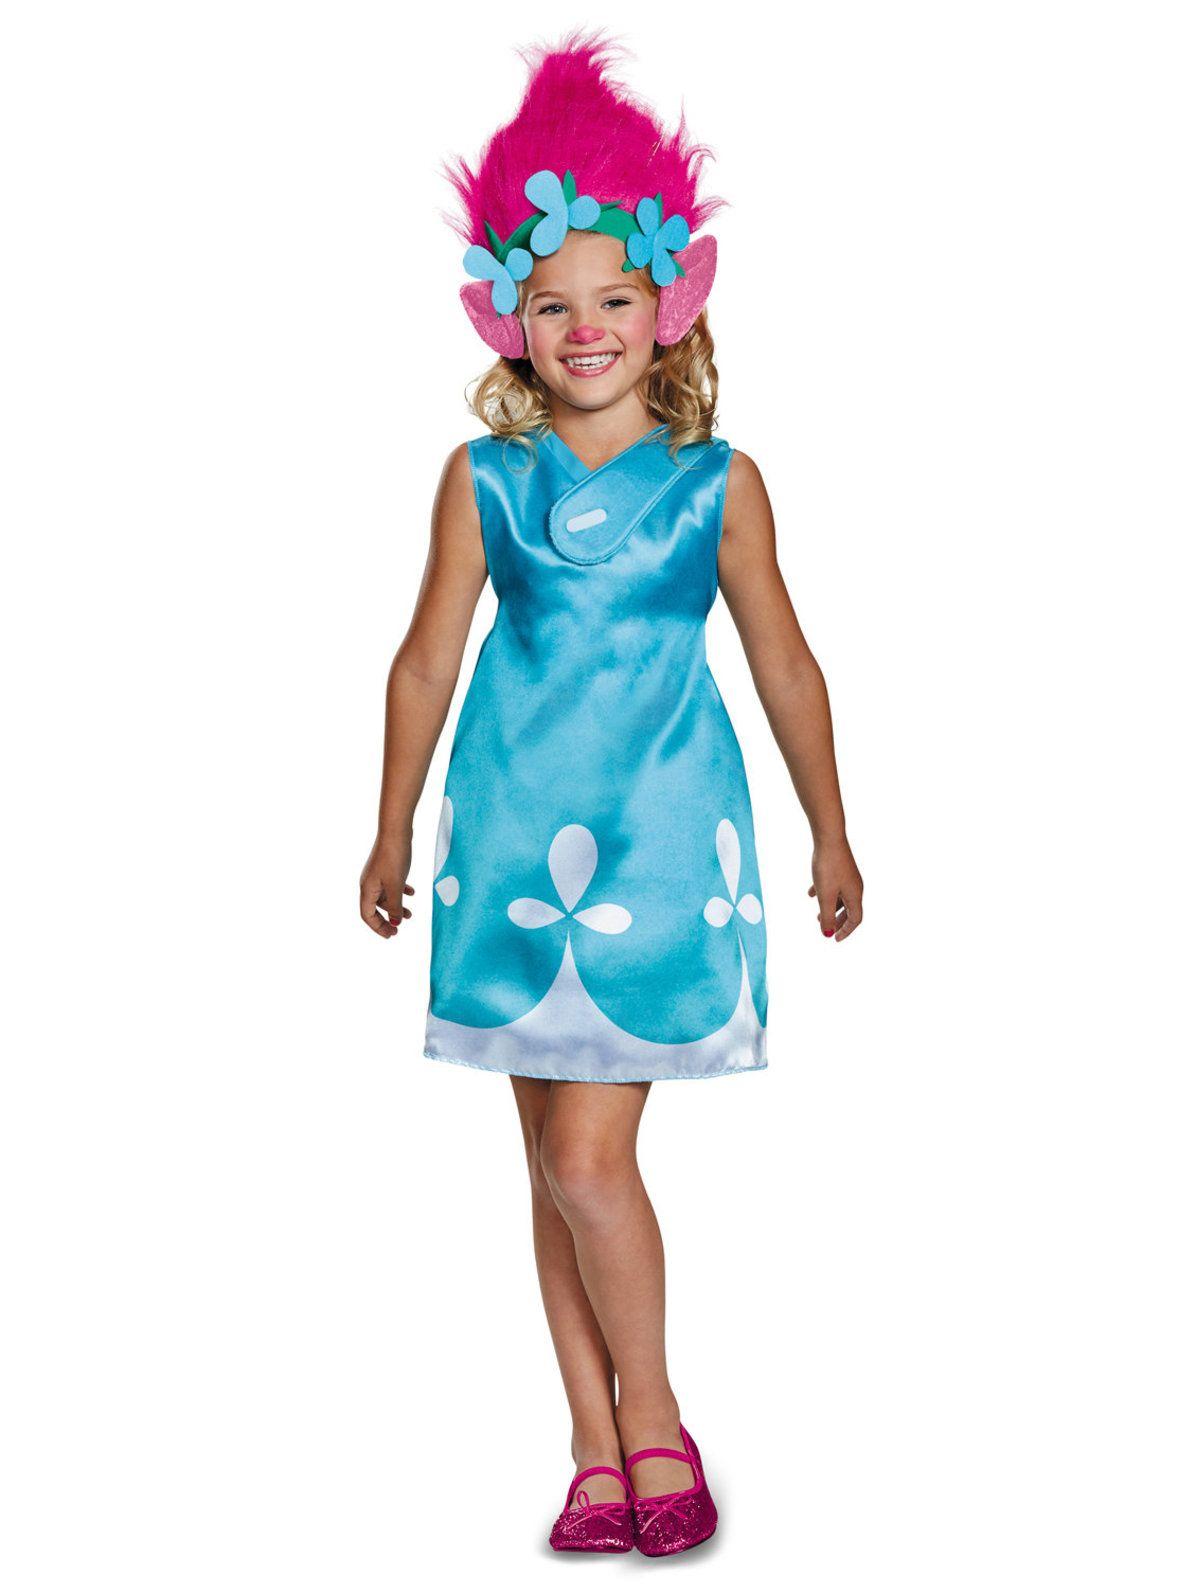 Poppy with Headband Costume Trolls Halloween Fancy Dress